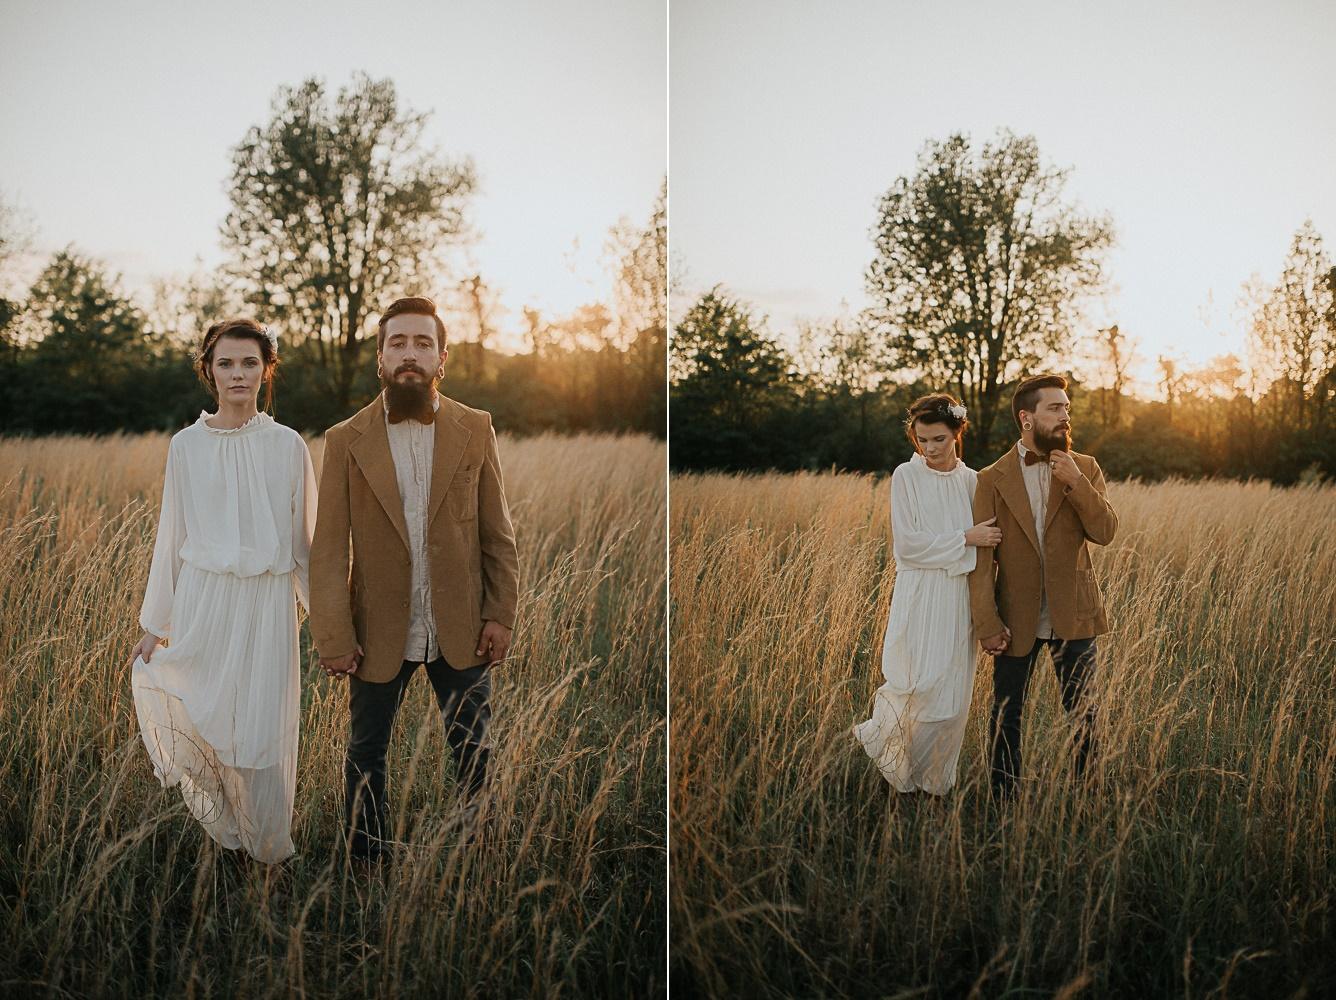 Cassie Cook Photography-Memphis TN-portrait and wedding photographer -7300-horz.jpg